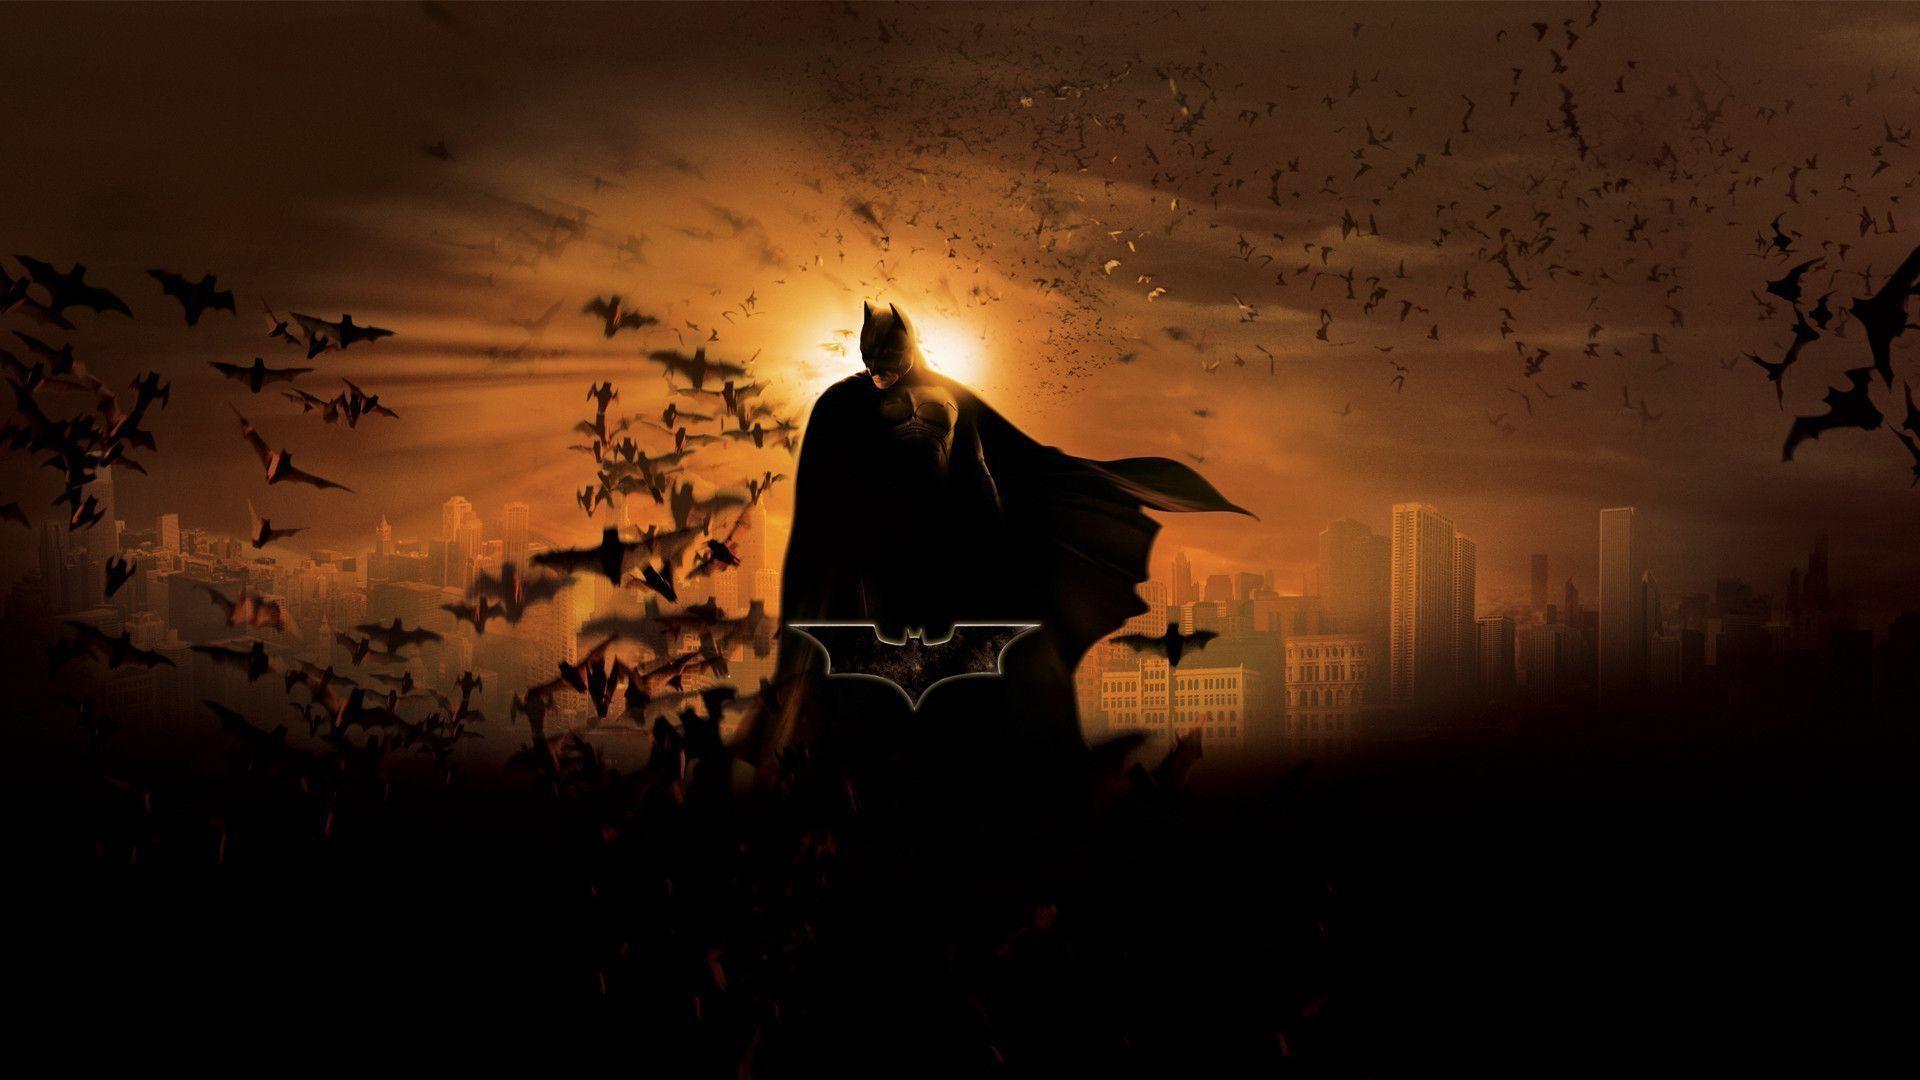 Download Wallpaper Mac Batman - 409551-free-download-batman-hd-wallpapers-1920x1080-macbook  Gallery_433354.jpg